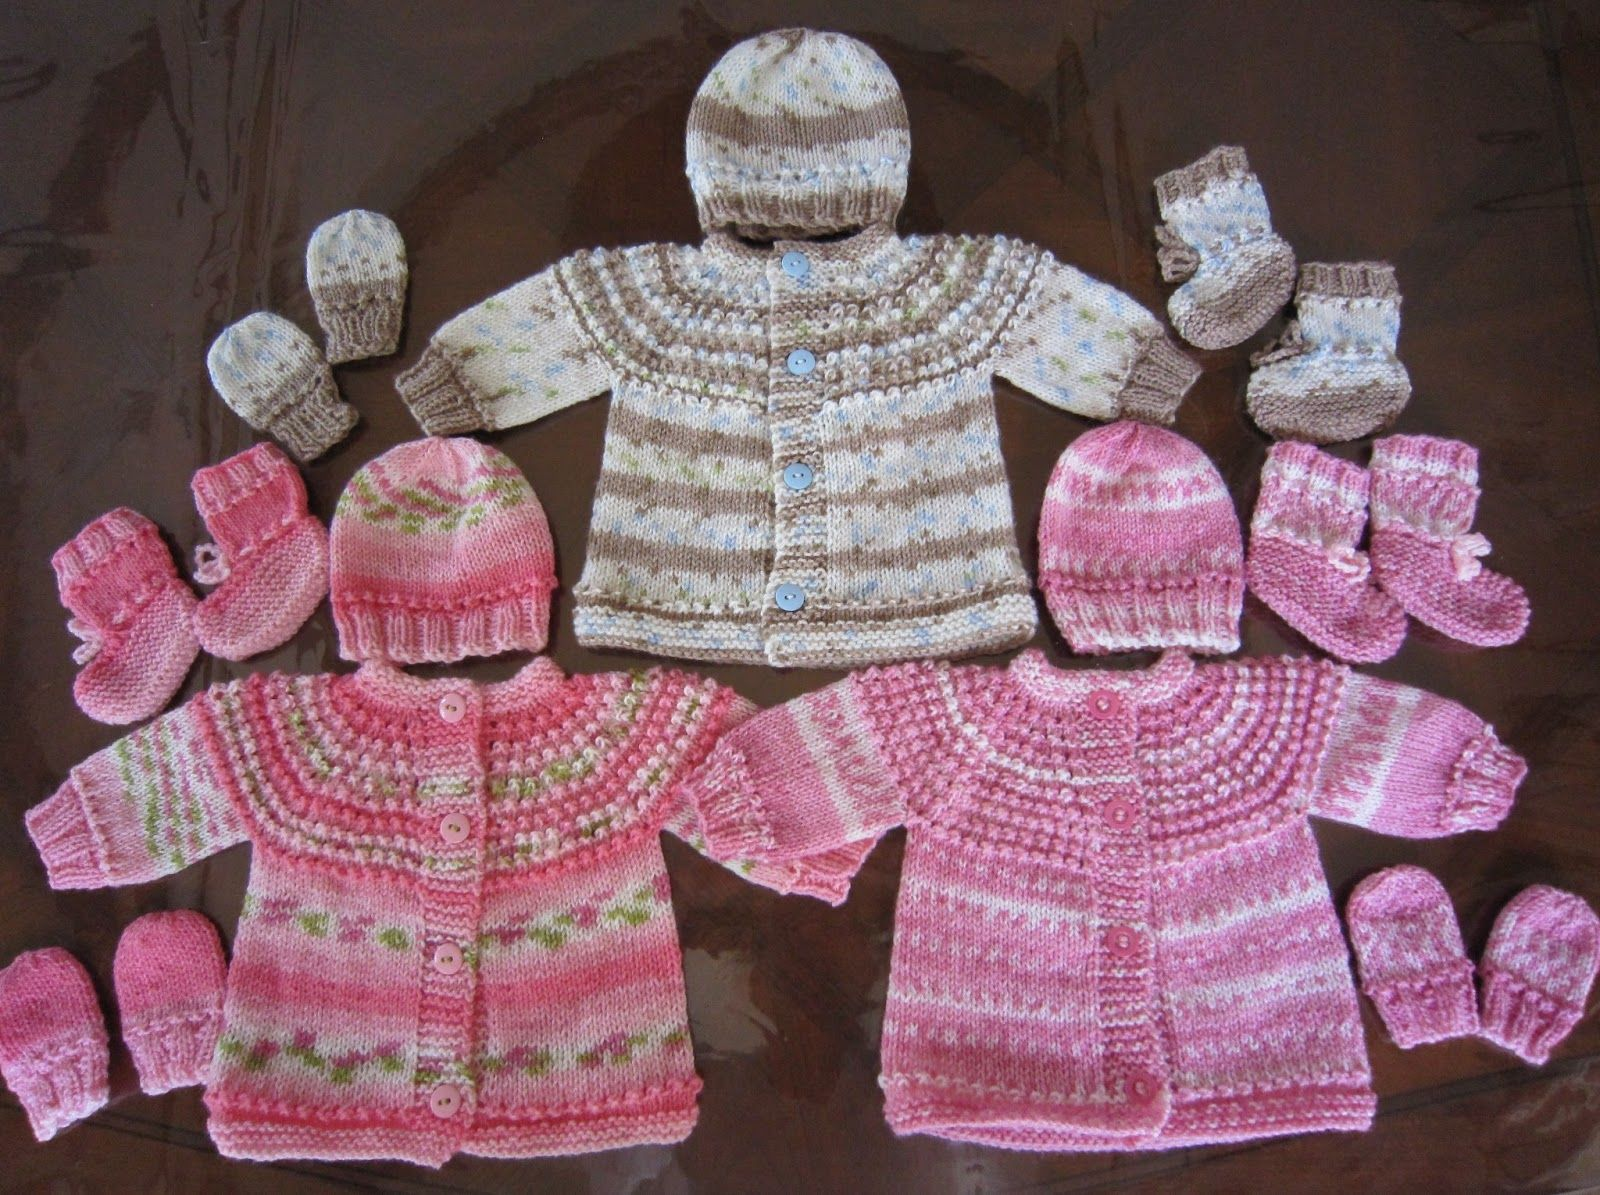 Sea trail grandmas preemie and newborn seamless sweater hat sea trail grandmas preemie and newborn seamless sweater hat mittens and booties set knit bankloansurffo Gallery